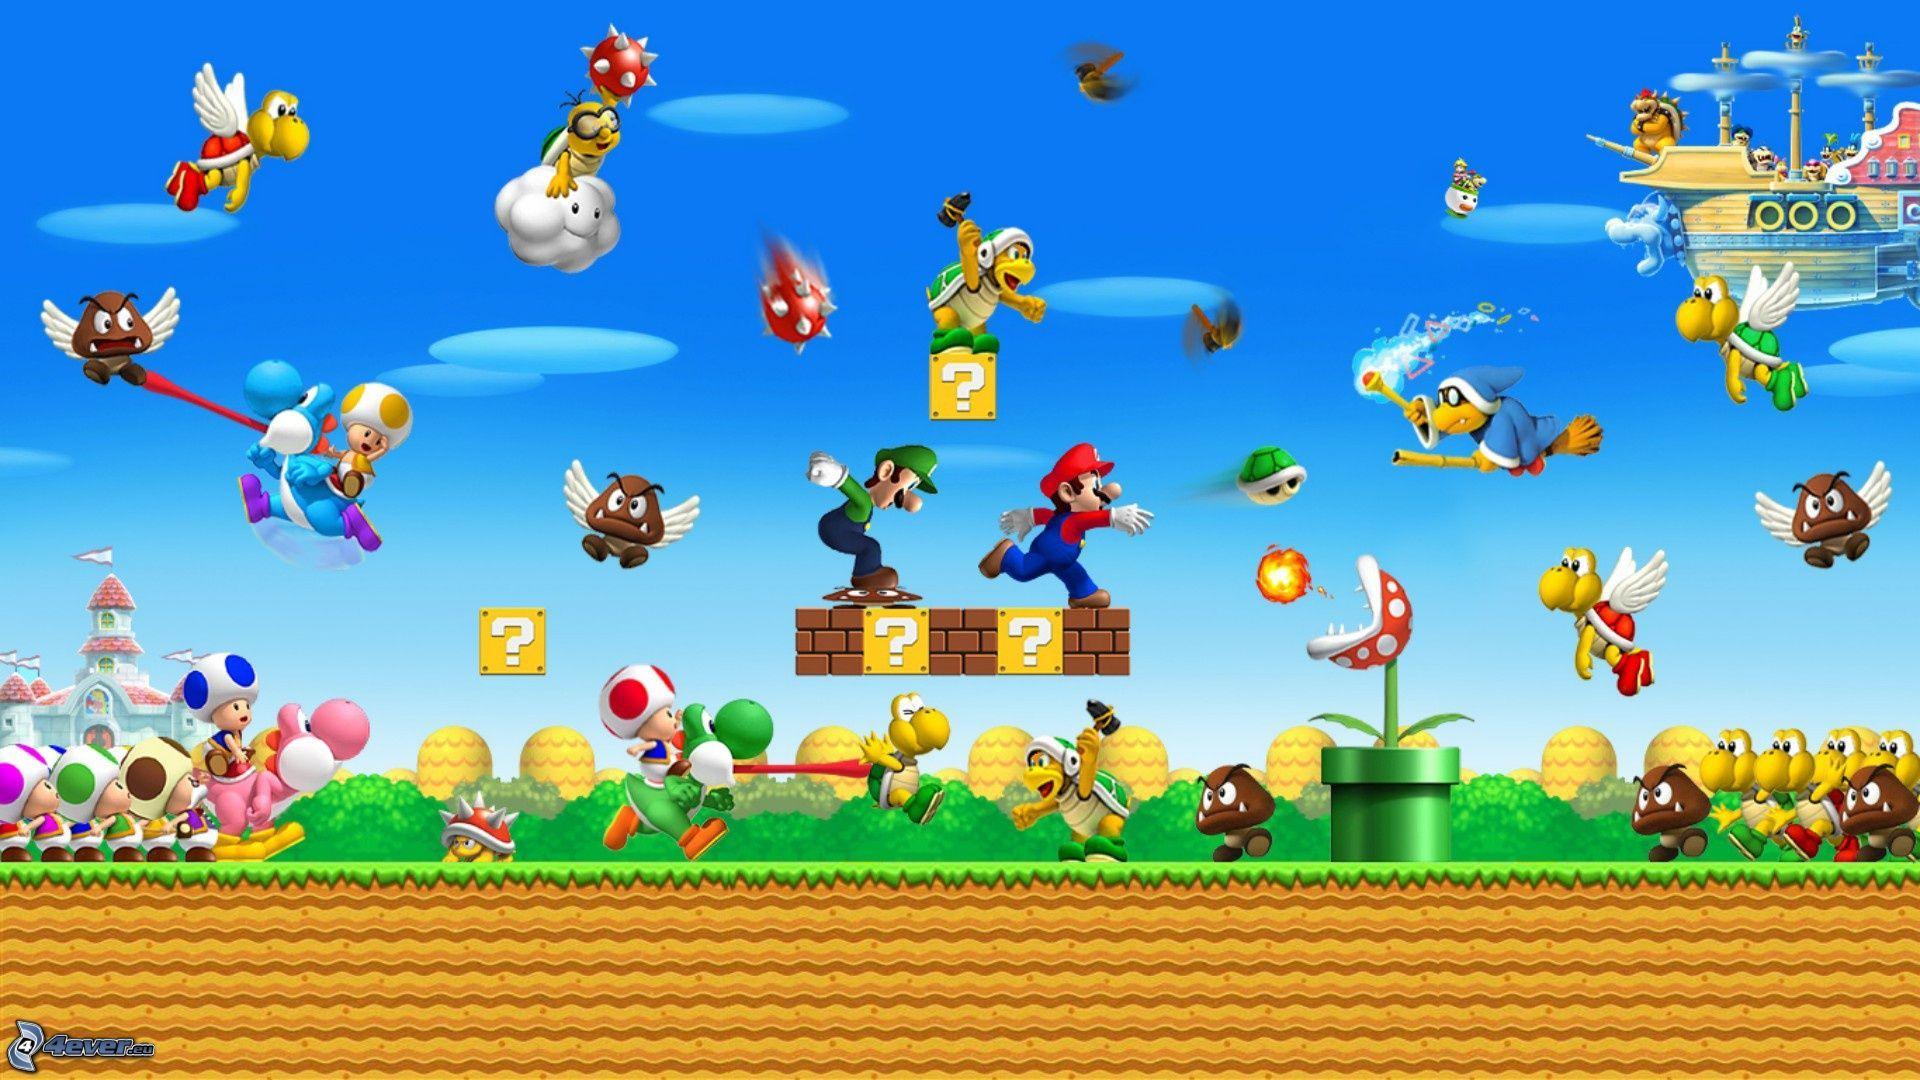 supermario Super mario bros, Mario und luigi